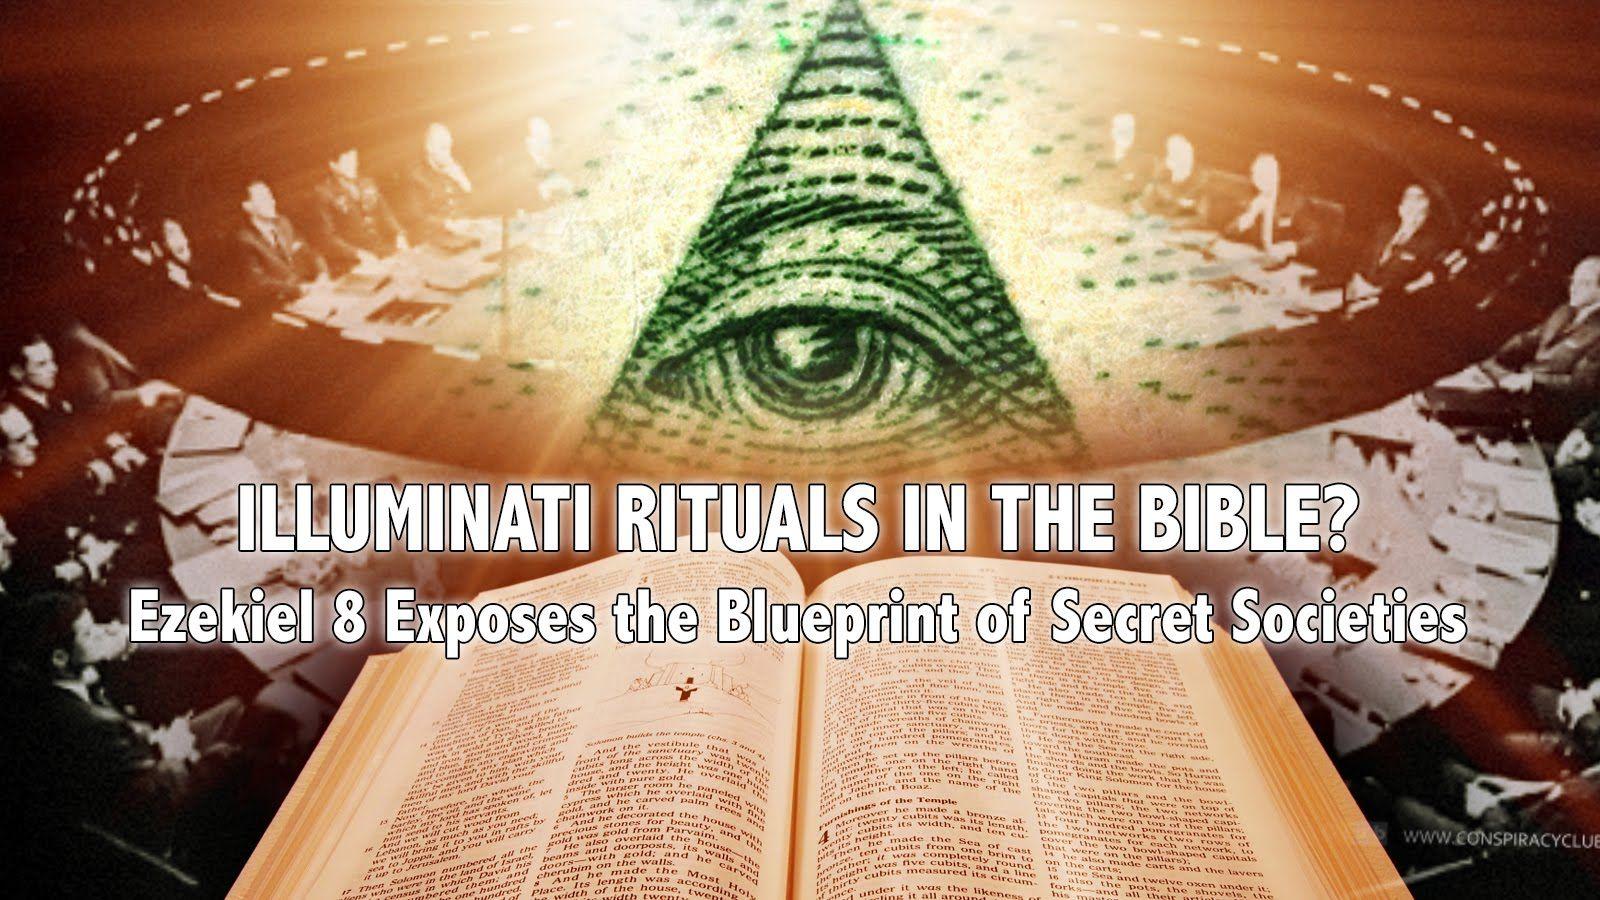 Illuminati rituals in the bible ezekiel 8 exposes the blueprint of flat earth illuminati rituals in the bible ezekiel 8 exposes the blueprint of secret societies malvernweather Gallery